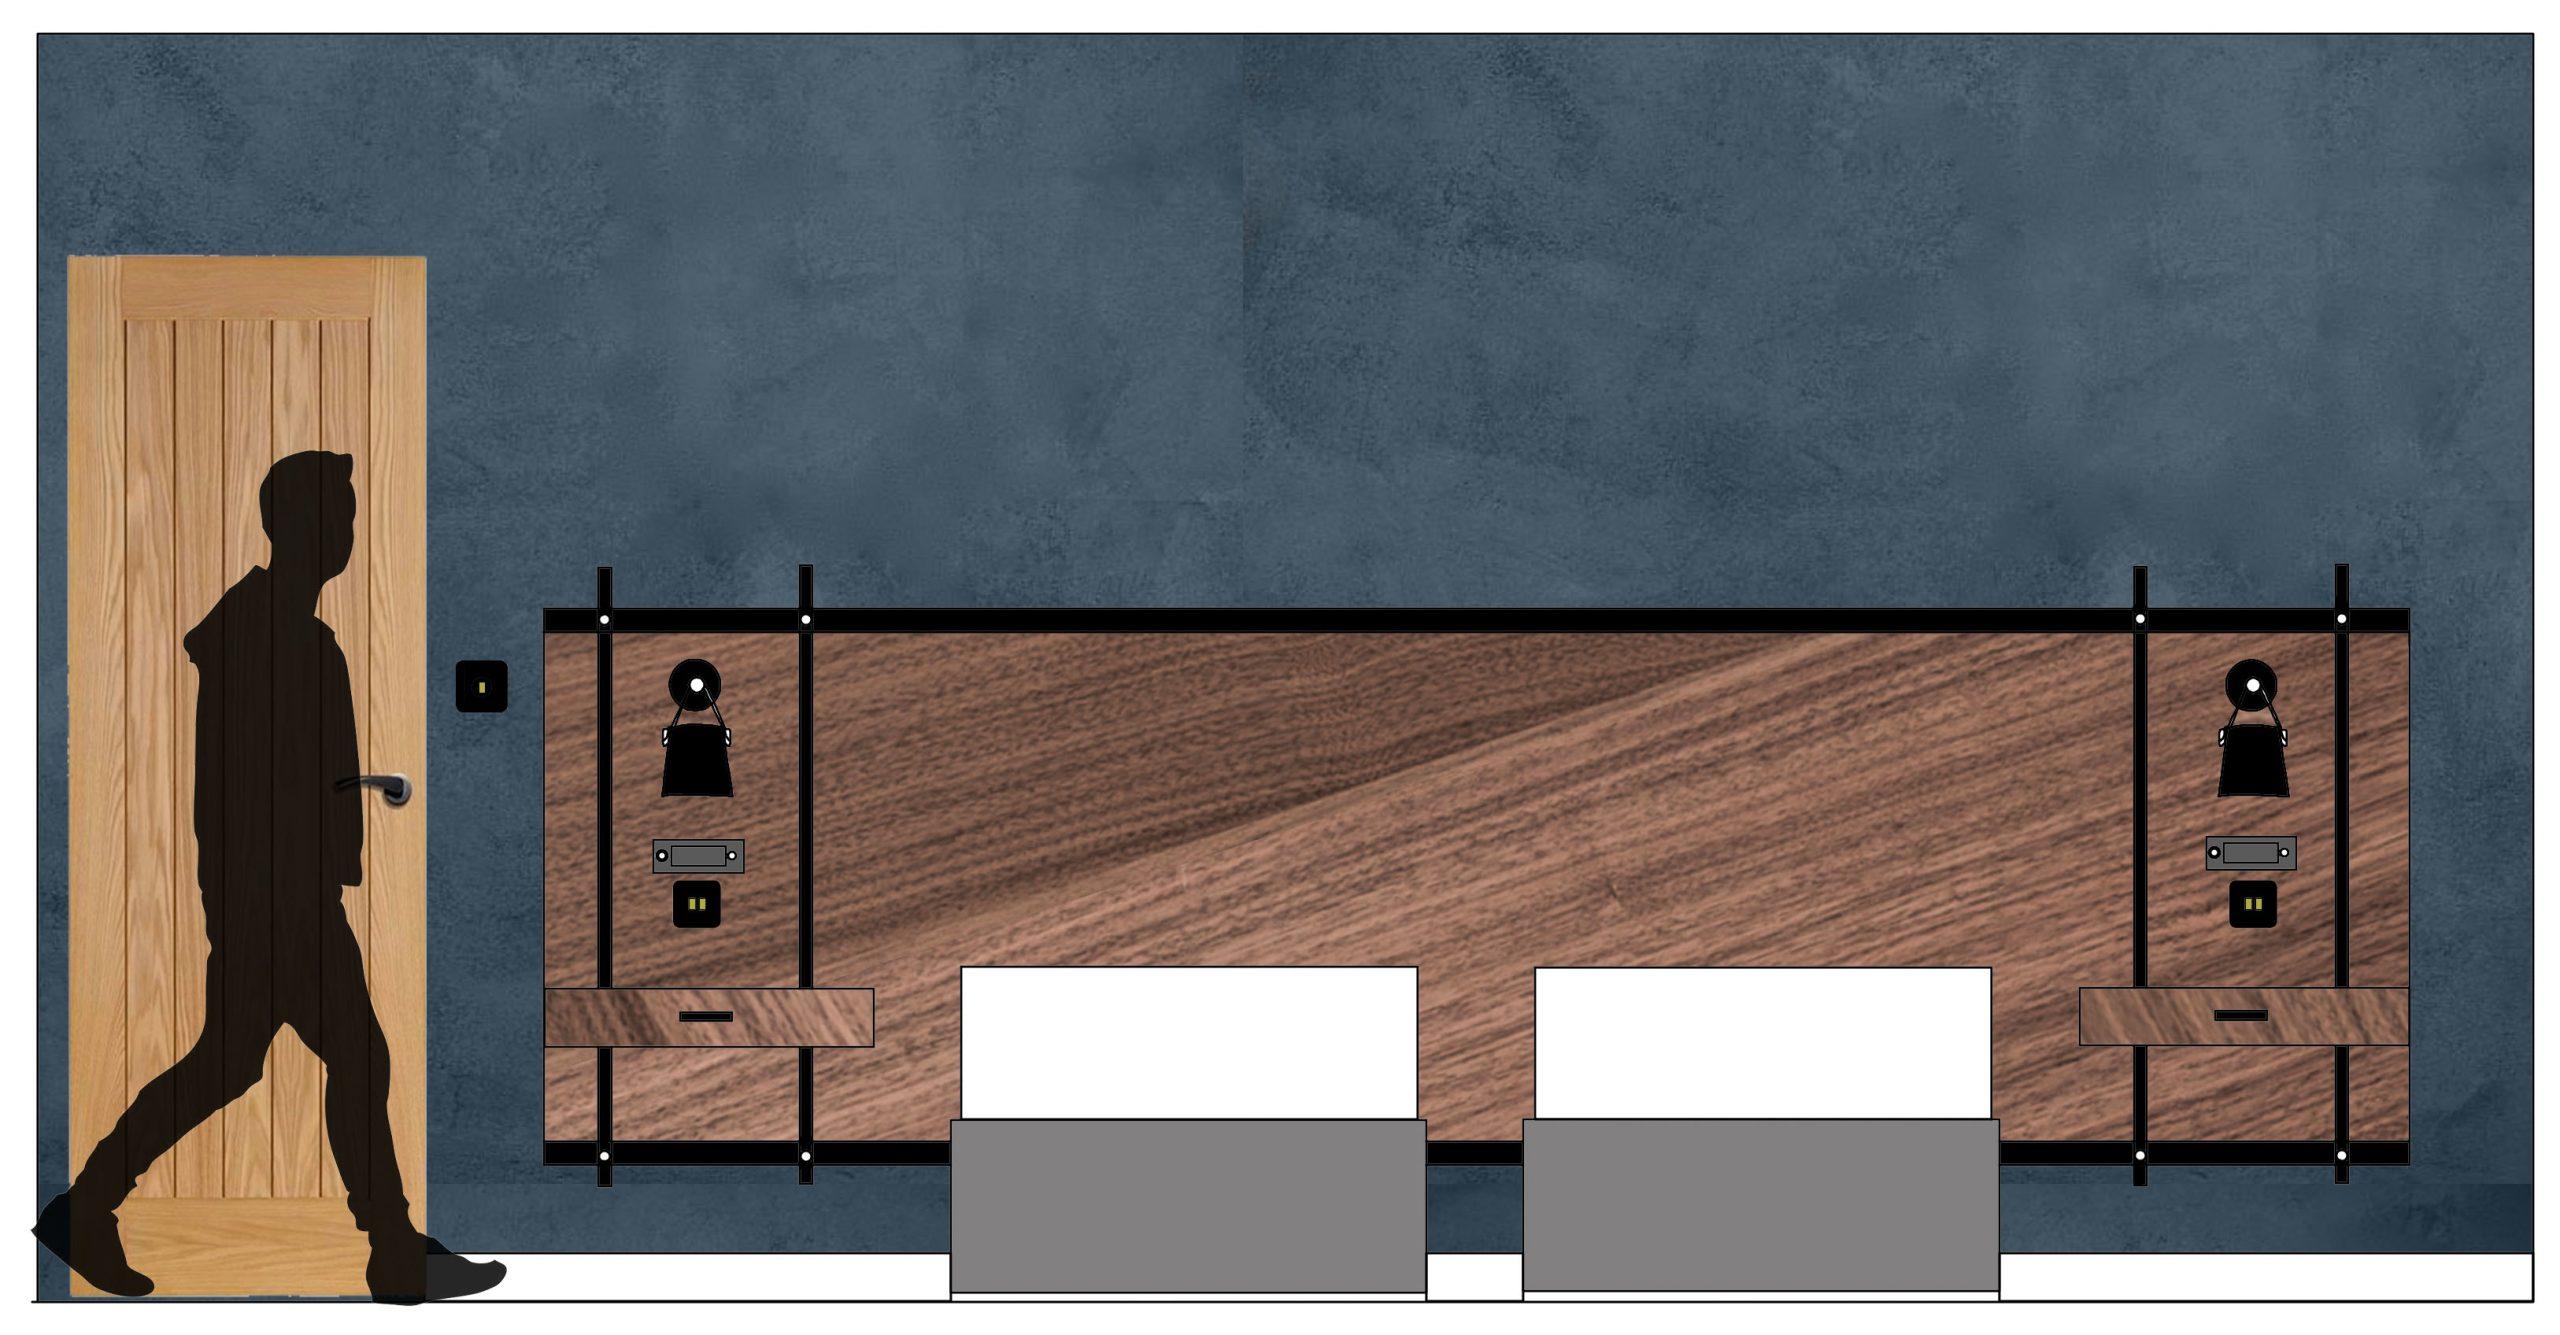 Treehouse Retreat- Final Major Project- Elevations